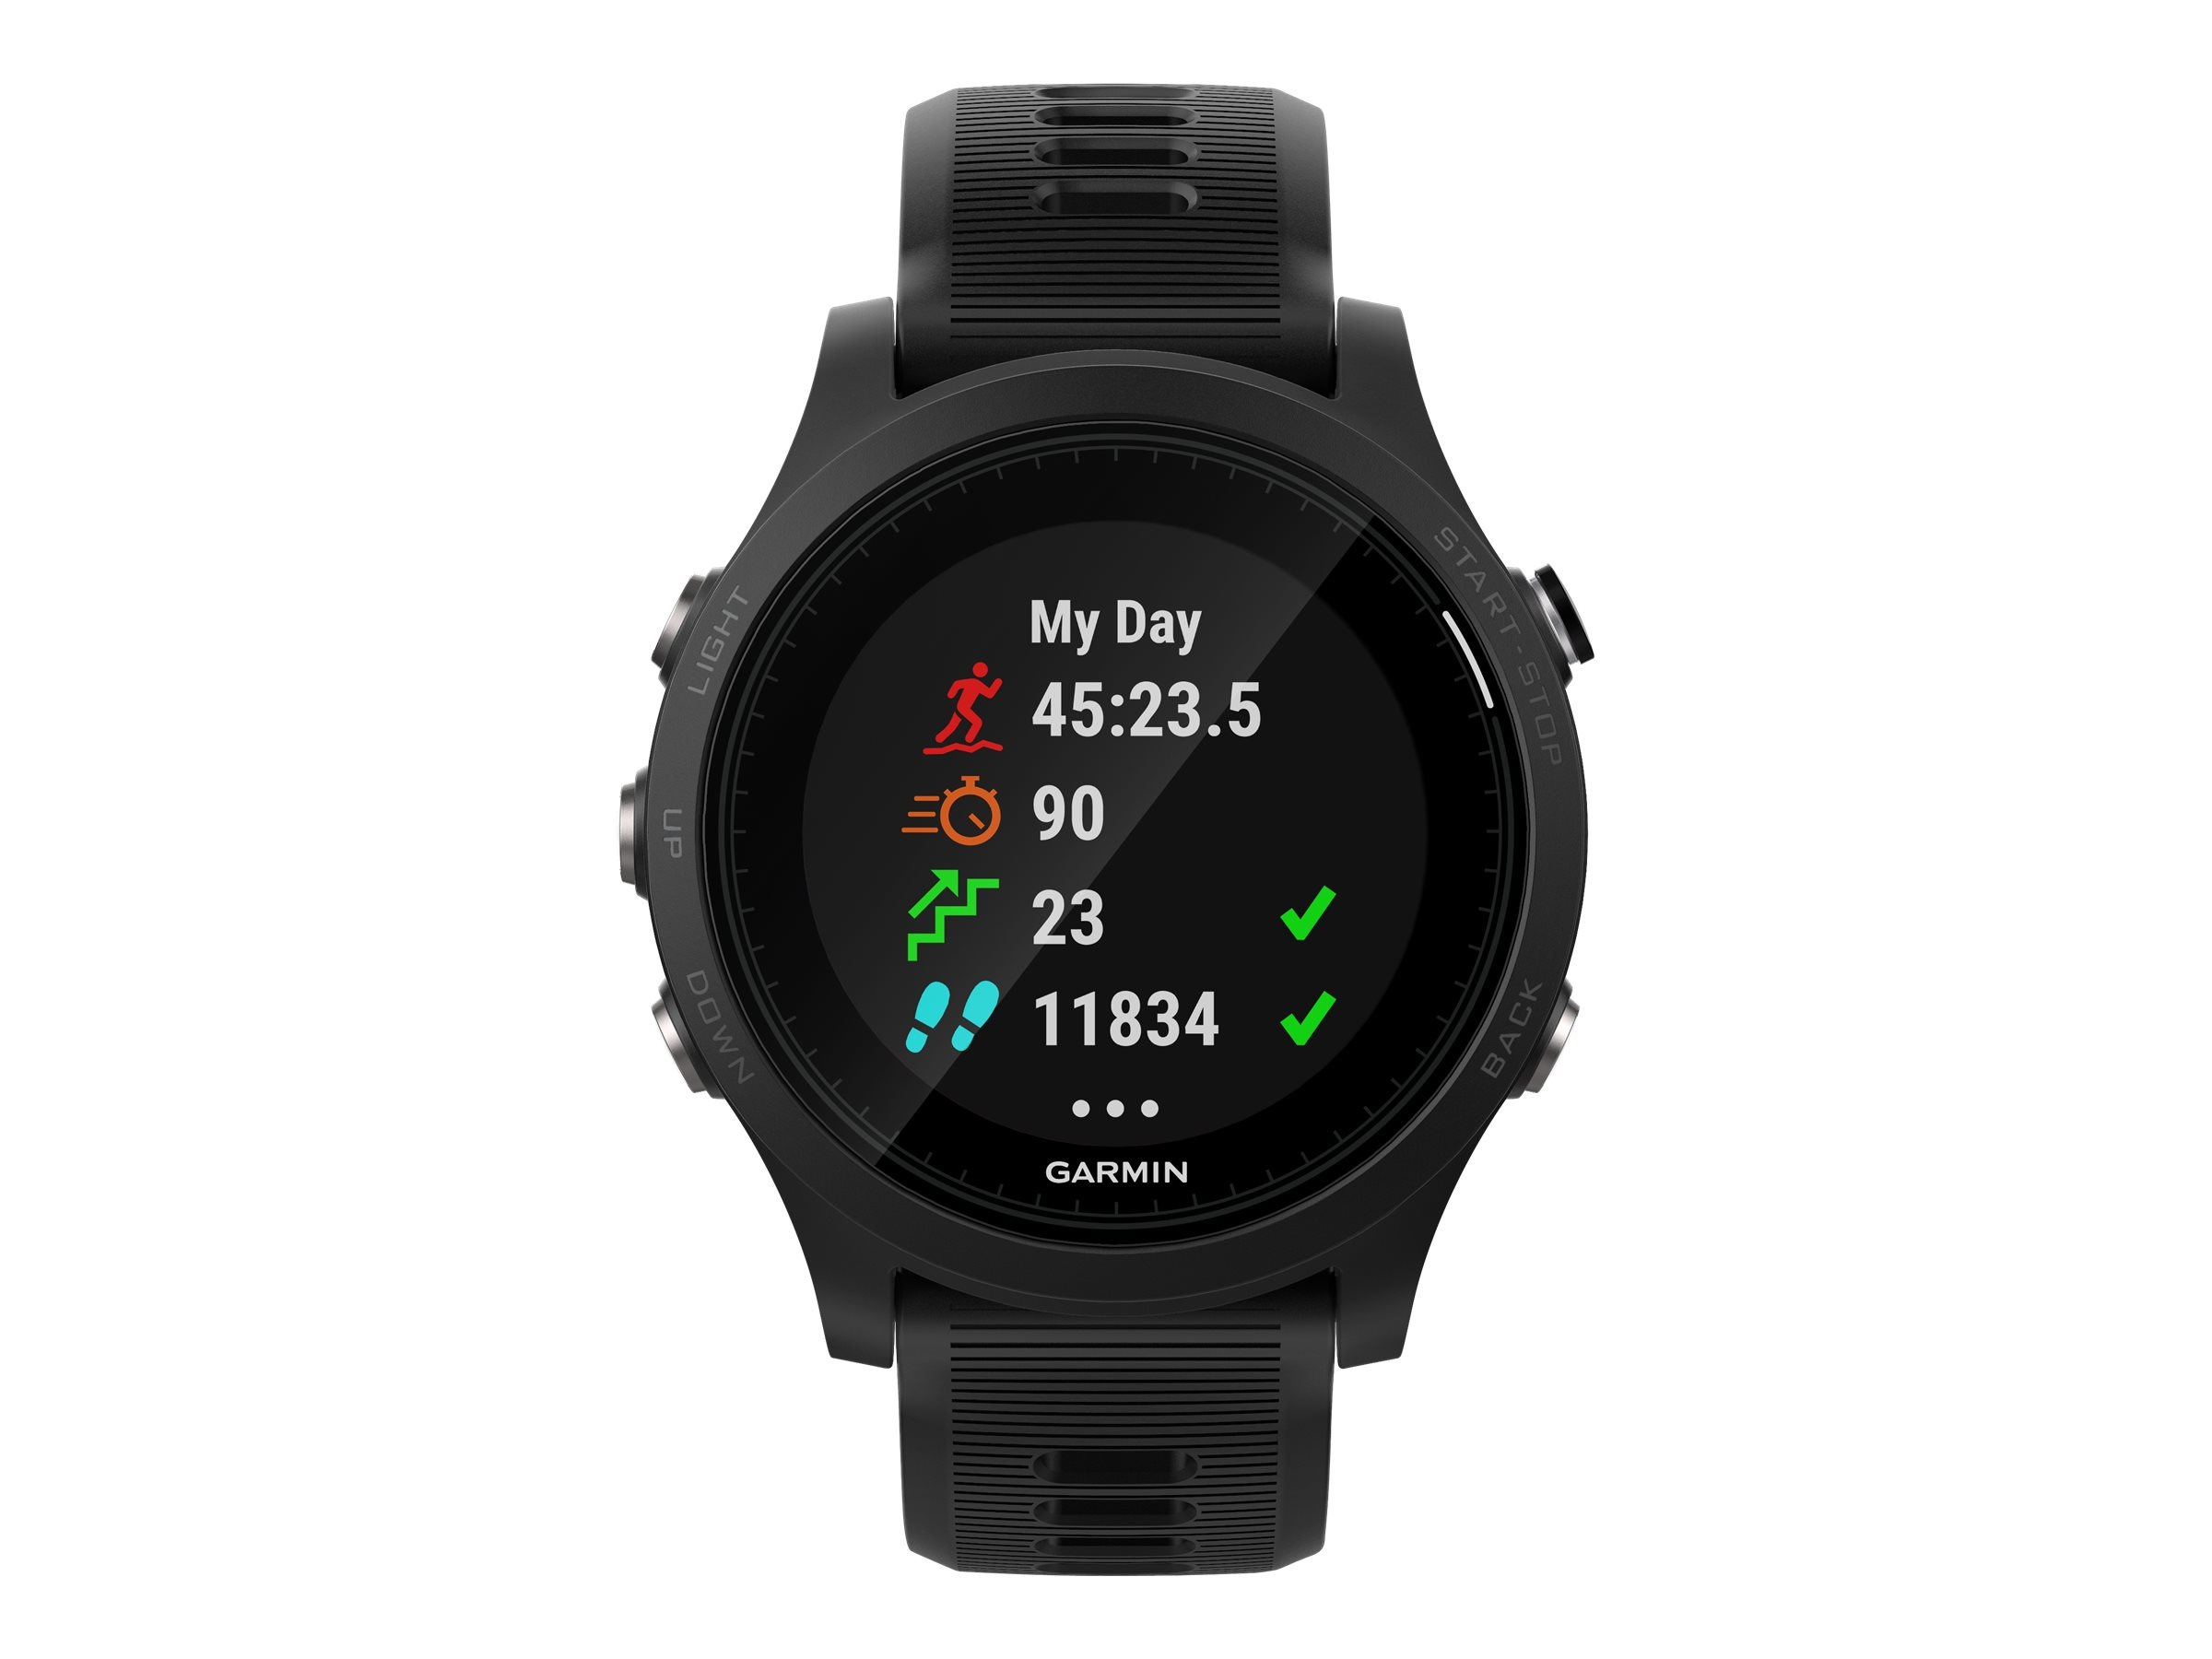 Image for Garmin Forerunner 935 Premium Gps Running/Triathlon Watch, Sunlight-Visible, 1.2 Display, Black from Circuit City